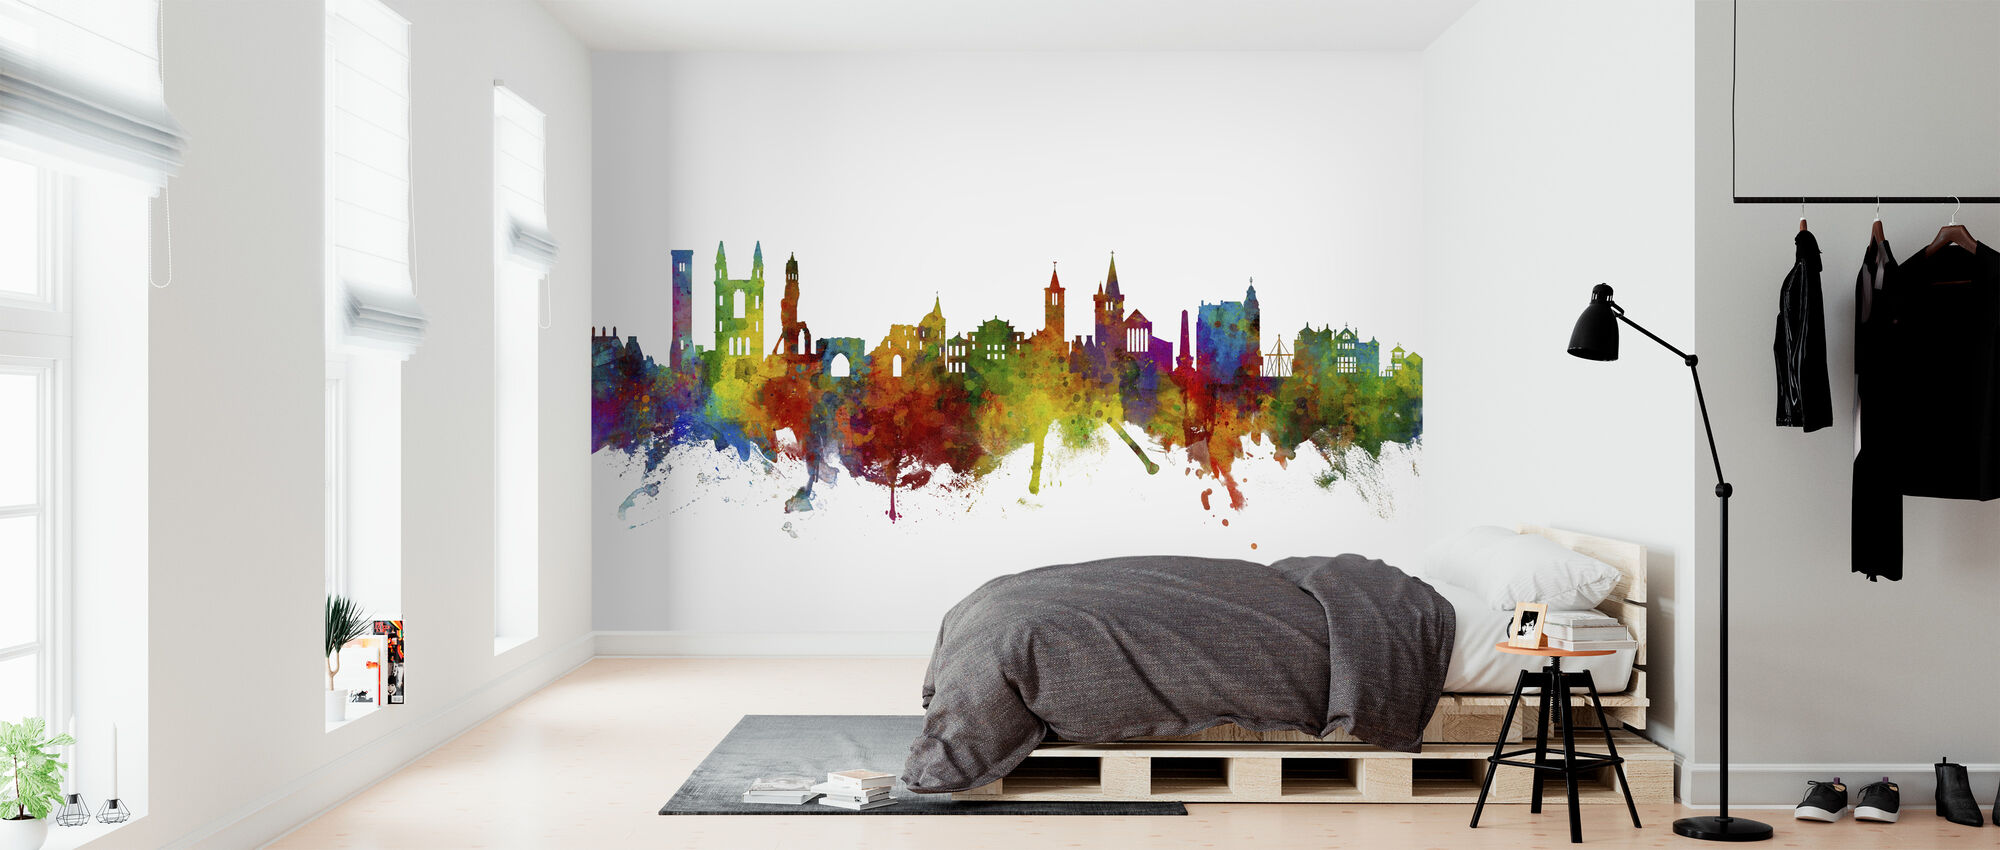 St Andrews Scotland Skyline - Wallpaper - Bedroom